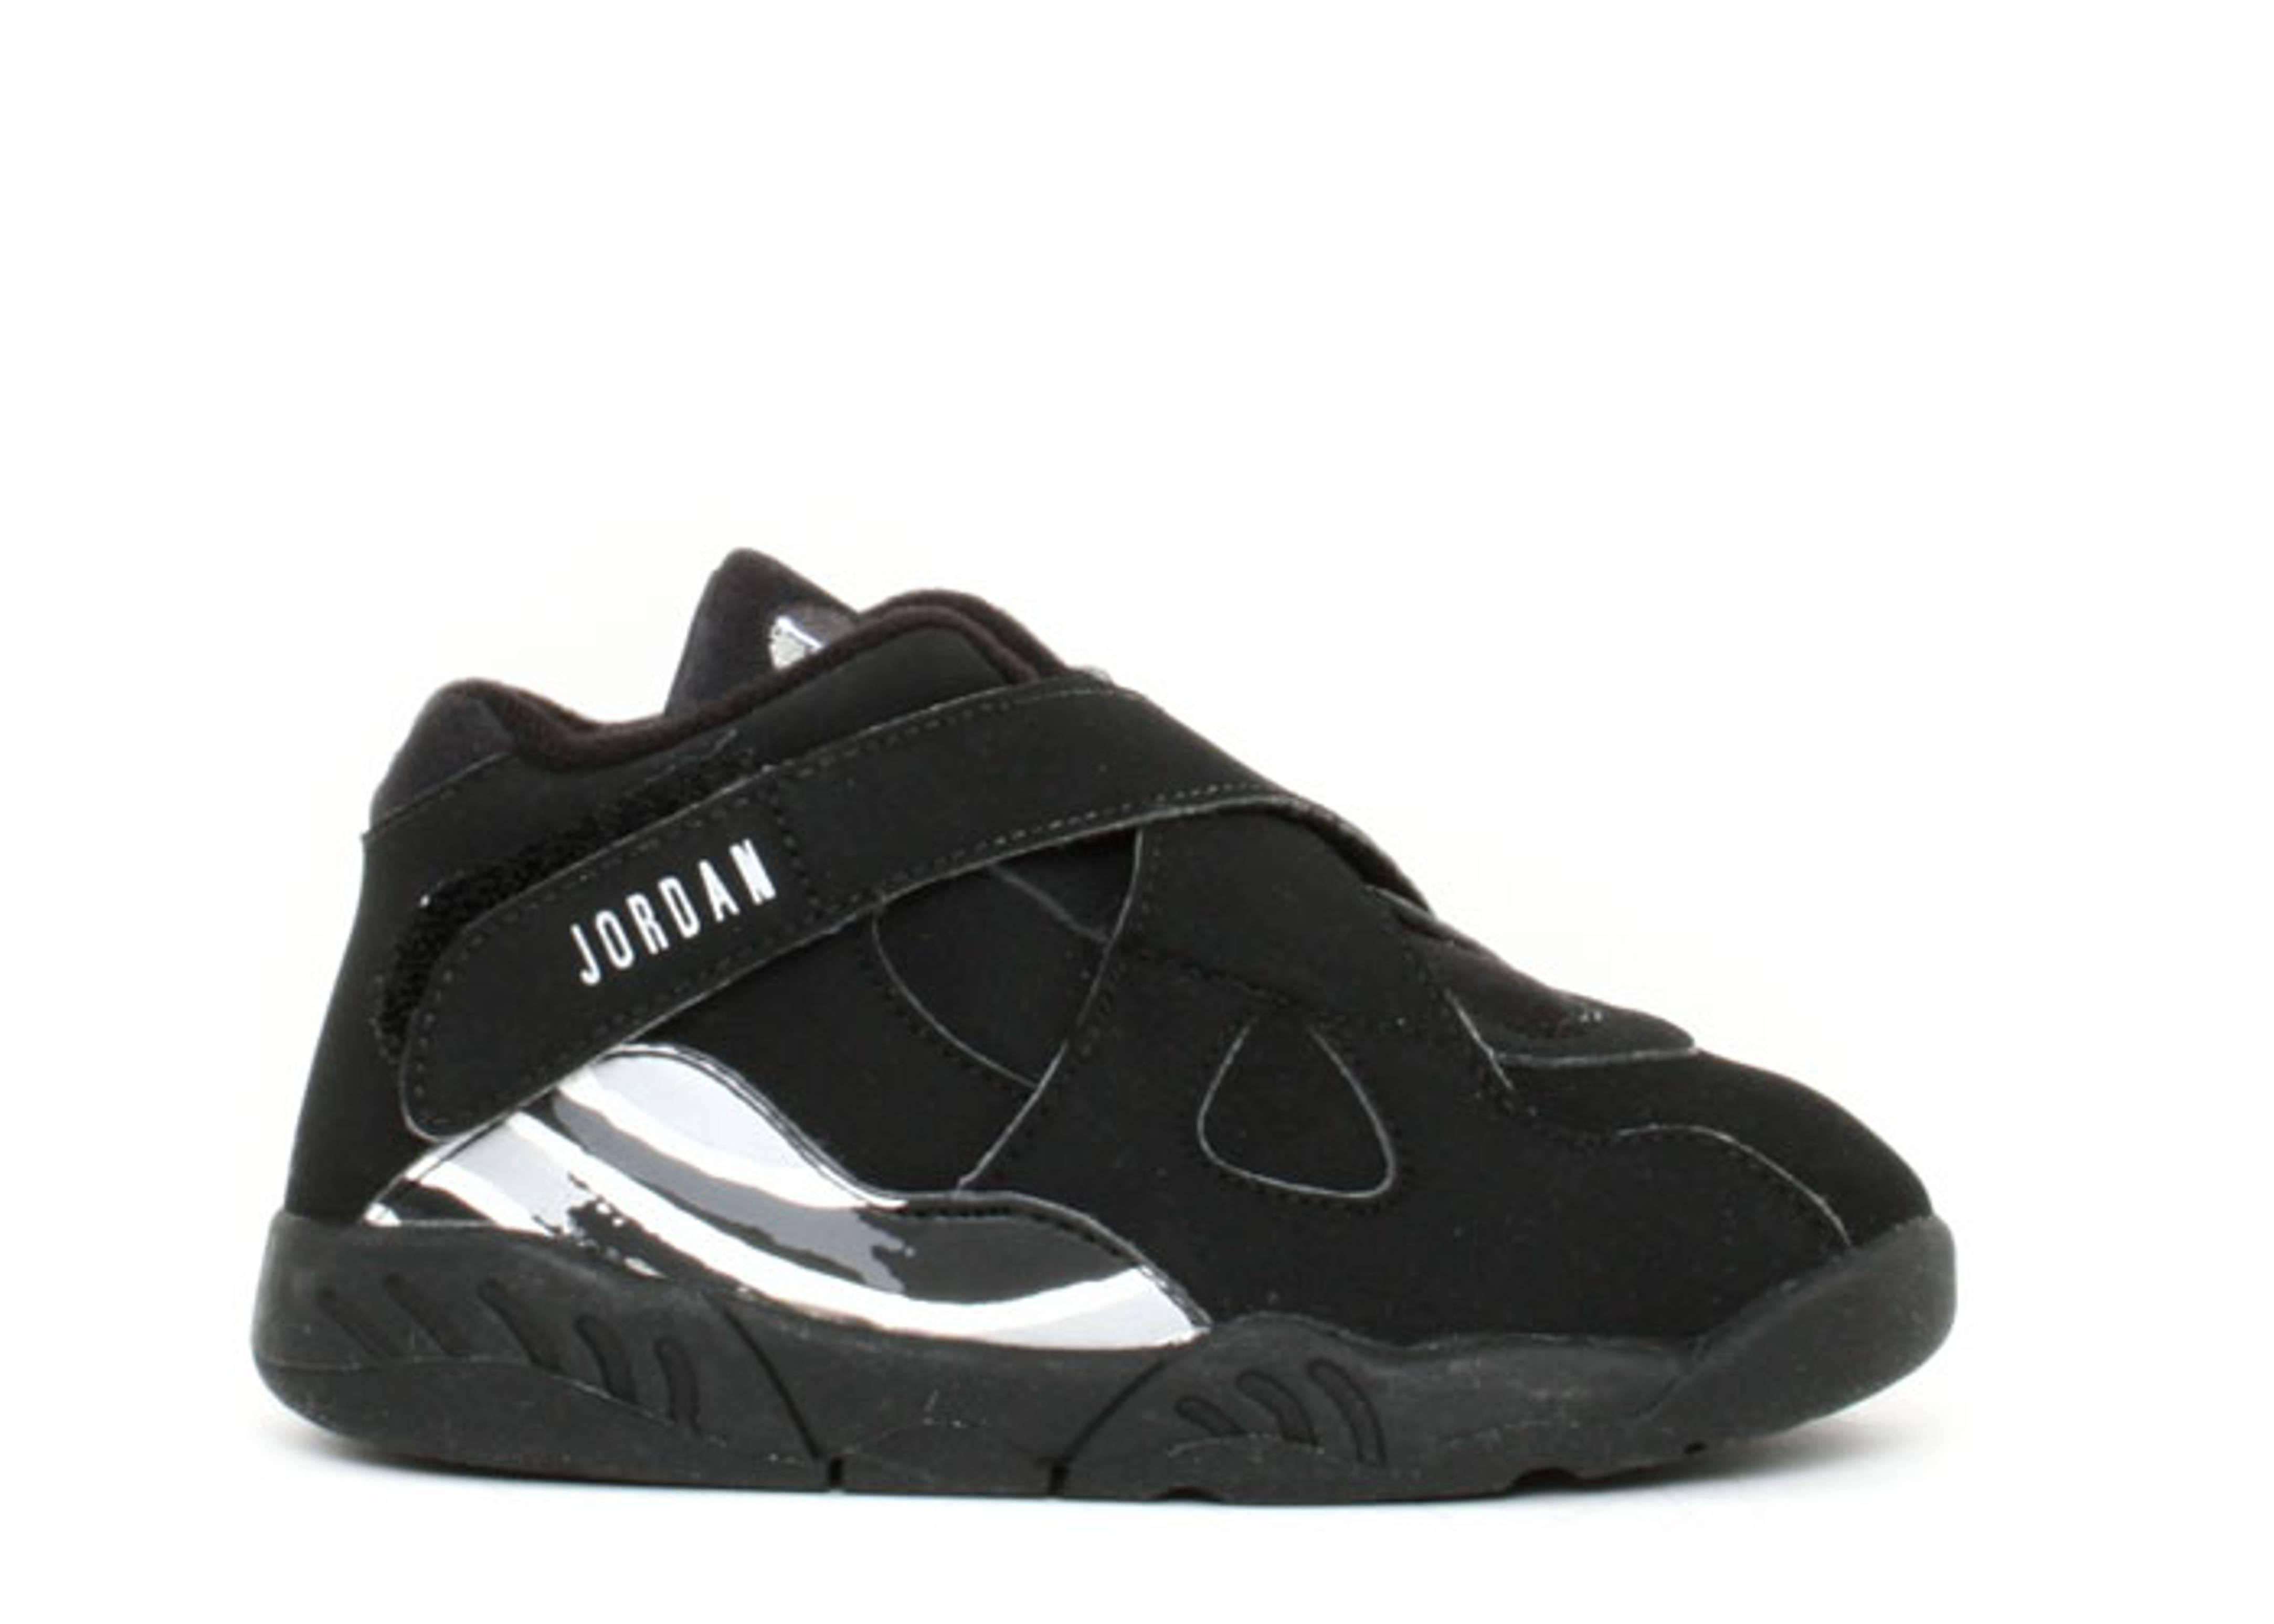 innovative design 6585f d694a Baby Jordan 8 Retro - Air Jordan - 305360 001 - black/chrome ...